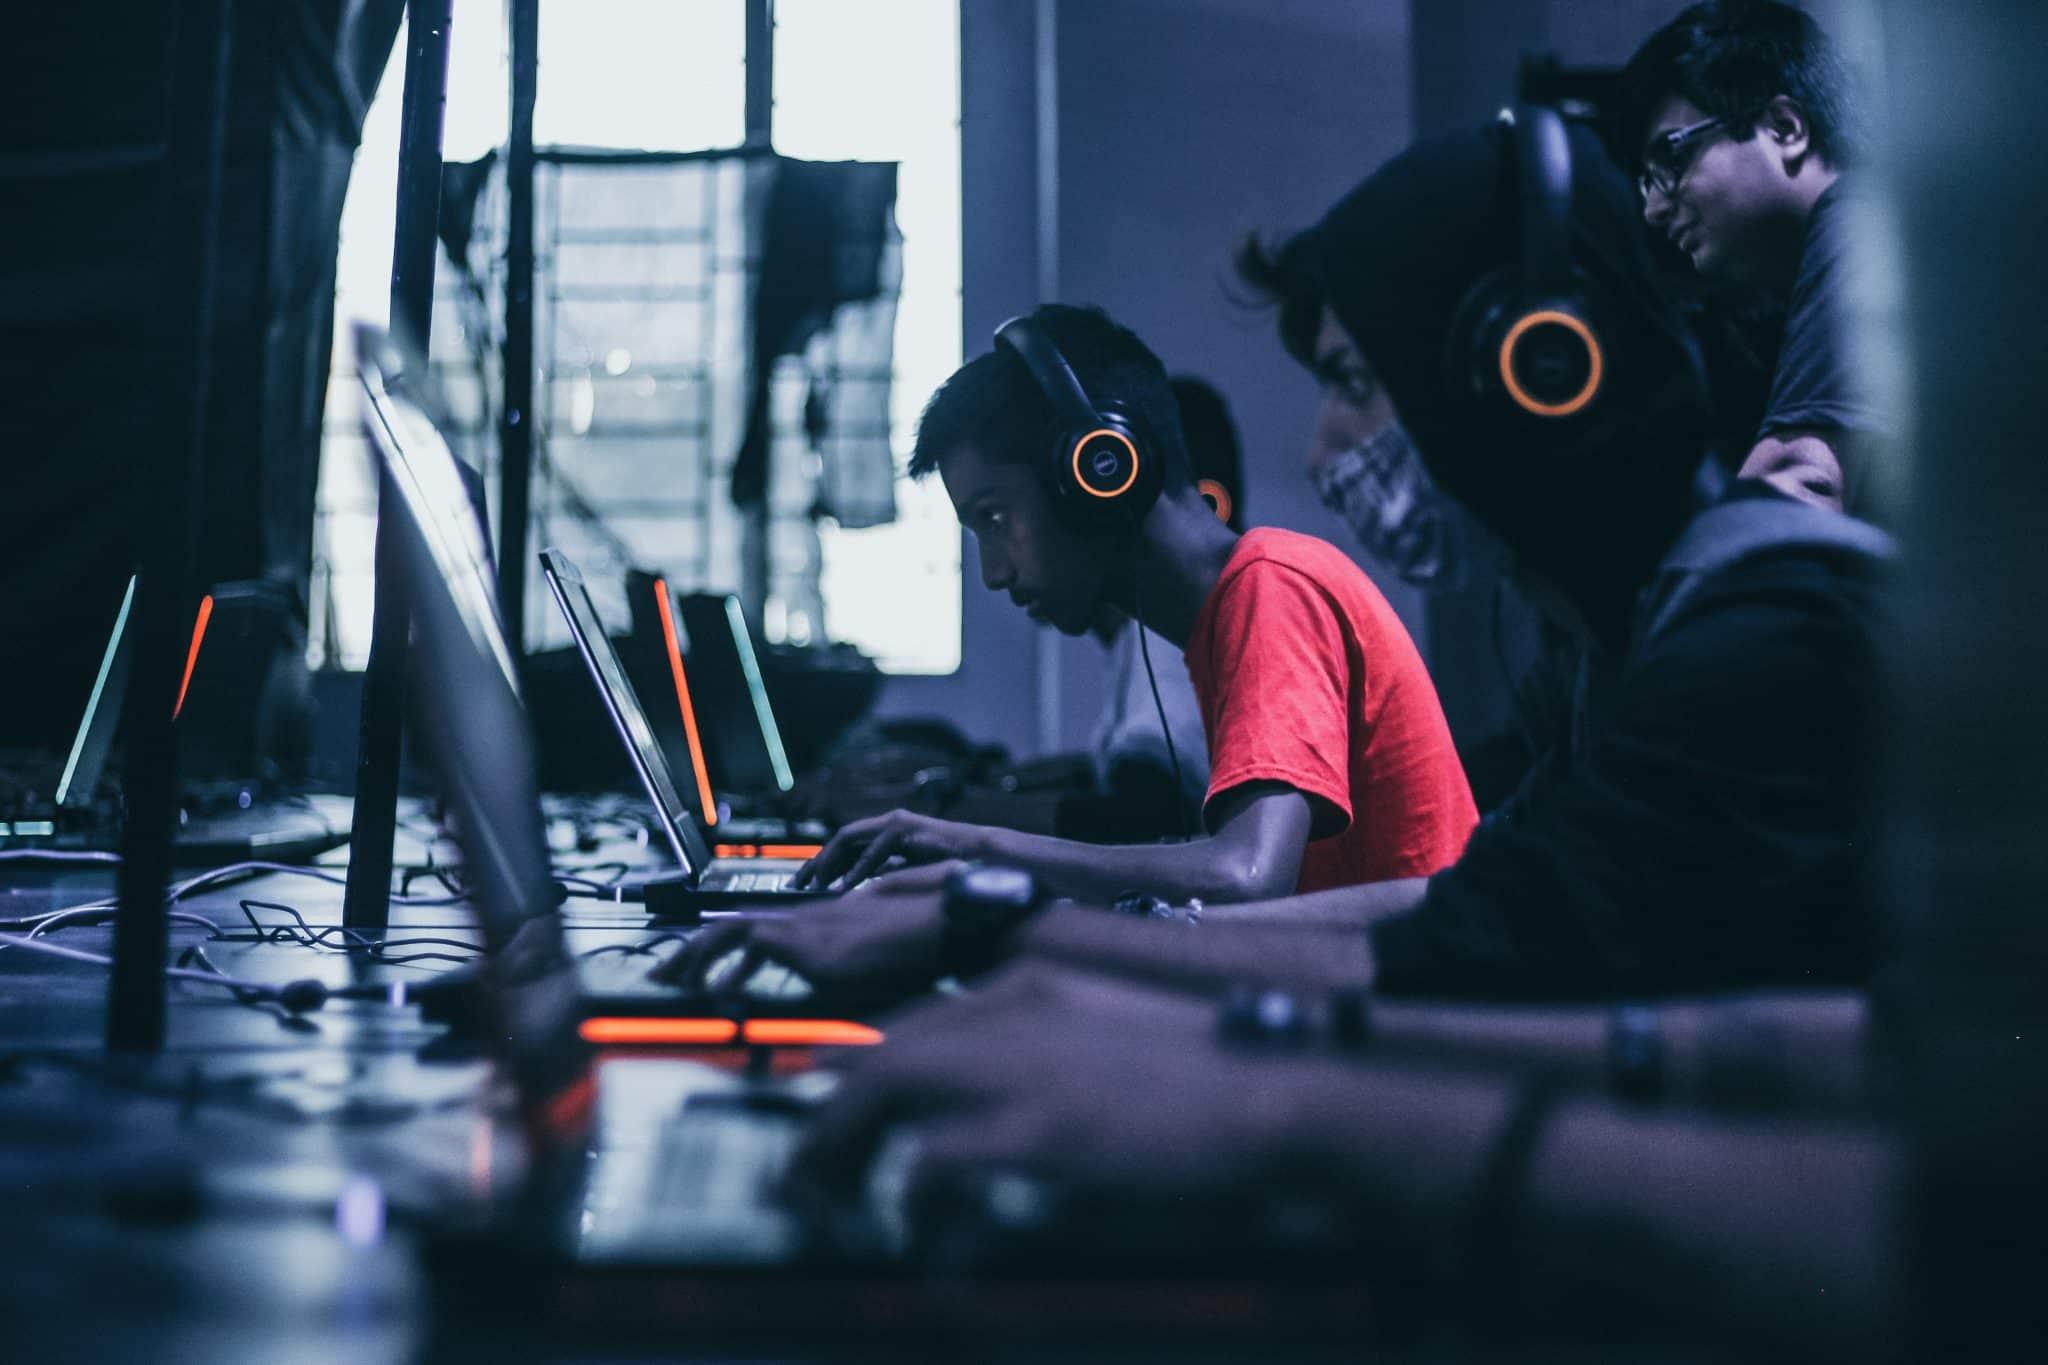 Chromebook vs laptop gaming